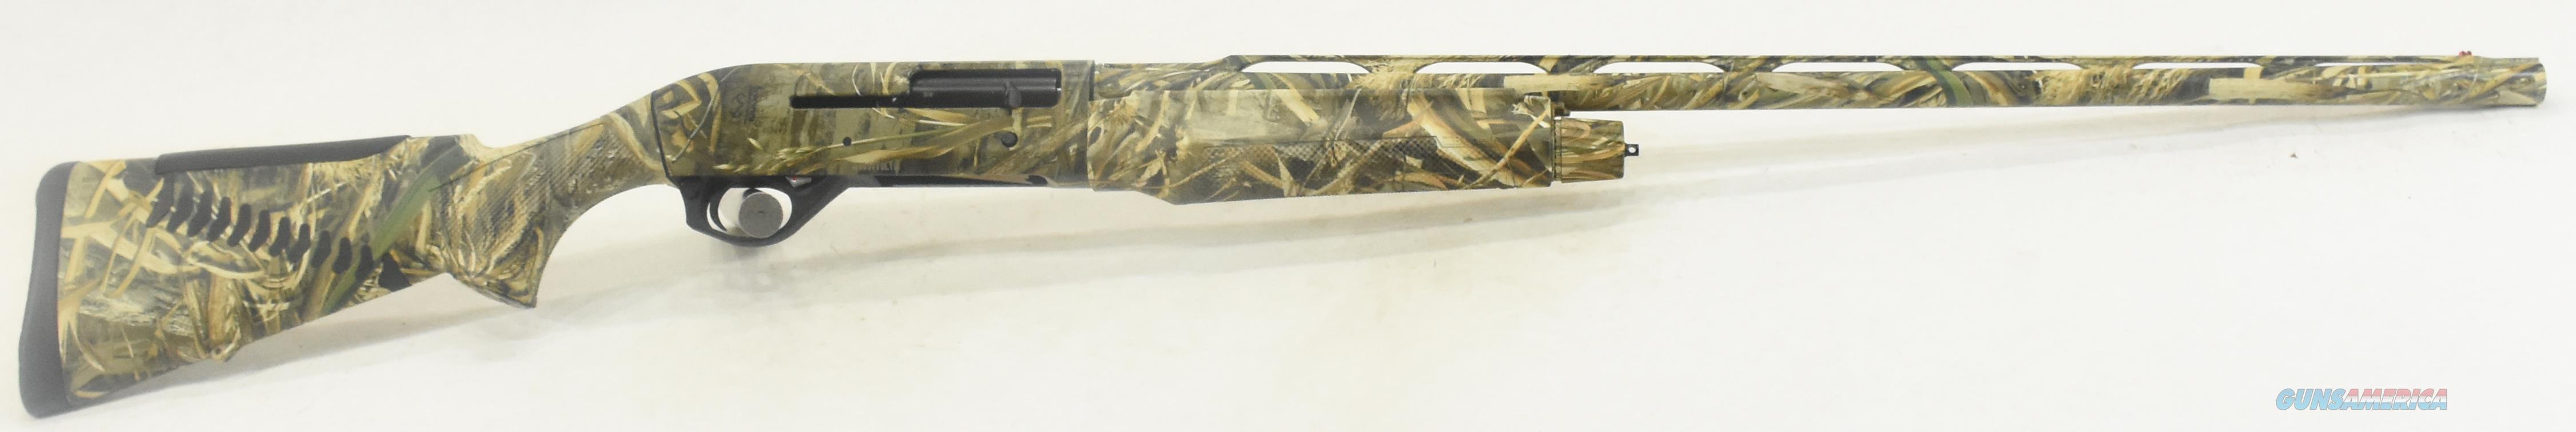 11099 Benelli M2 Field Max 5 Camo 20 Ga 28In  Guns > Shotguns > Benelli Shotguns > Sporting